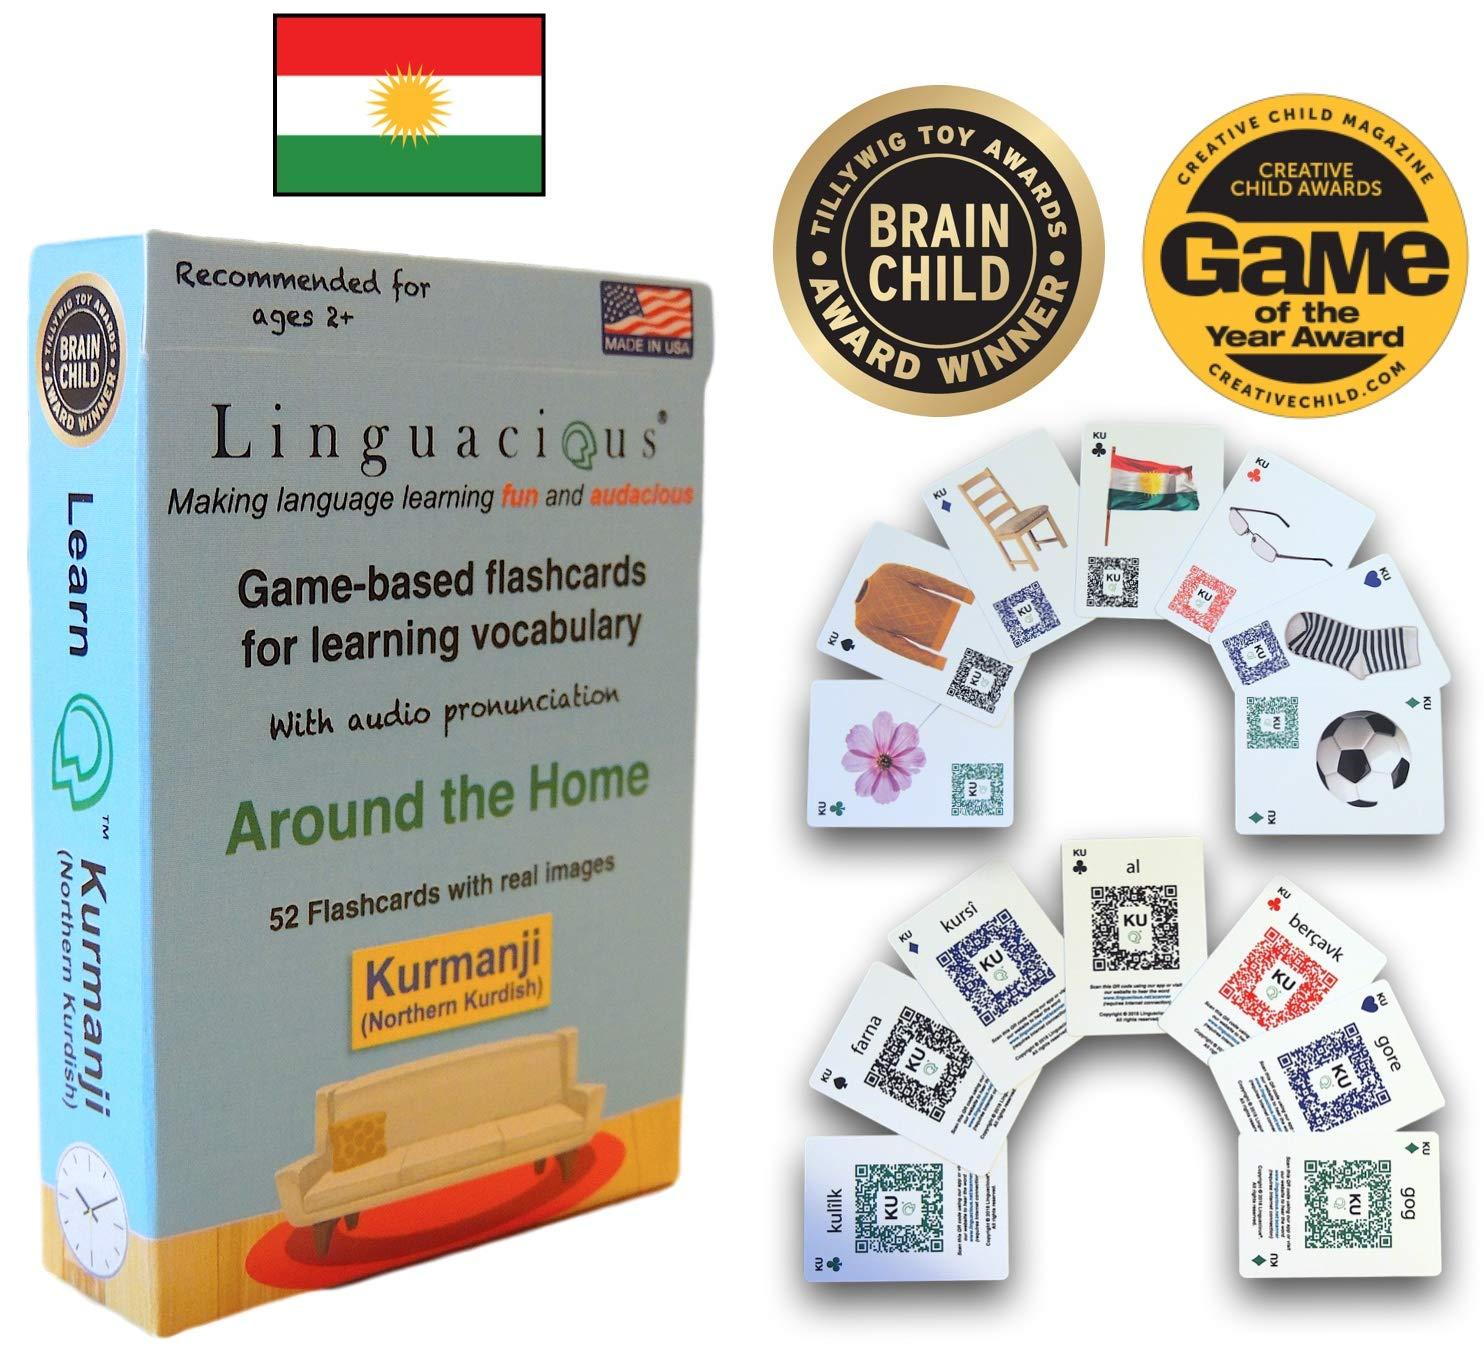 Linguacious Award-Winning KURMANJI Kurdish The Home Flashcard Game - with Audio! by Linguacious